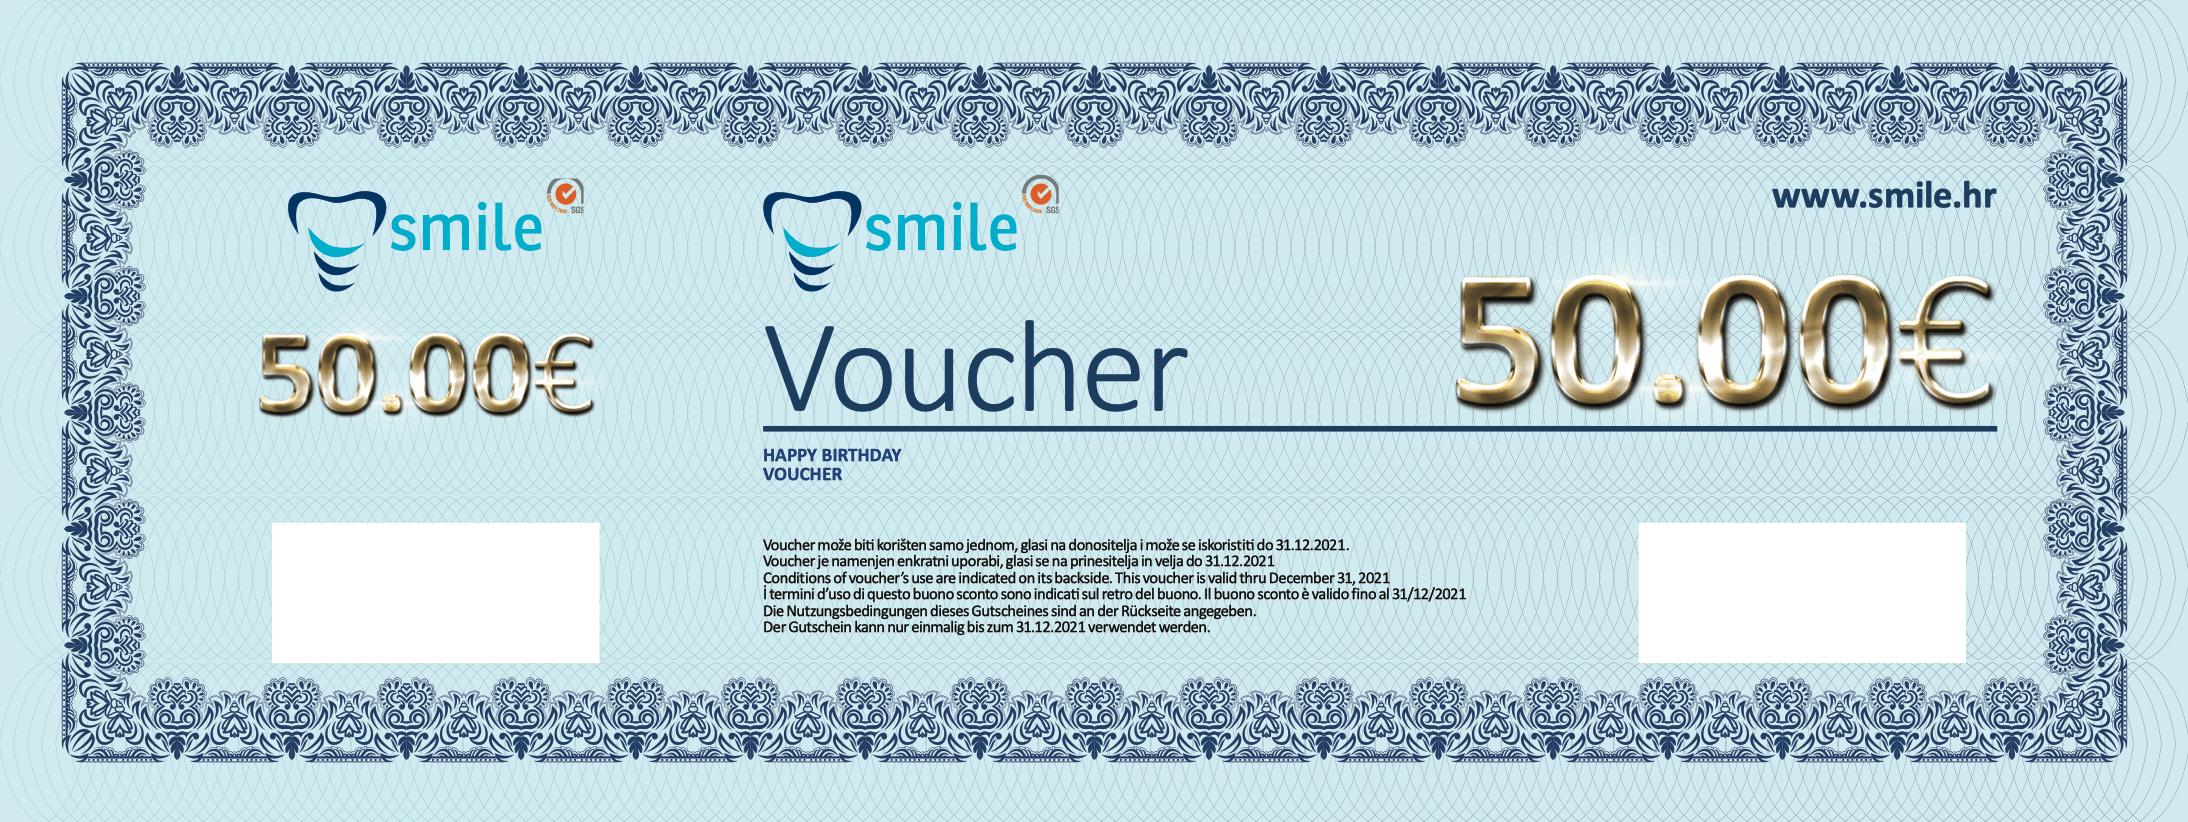 Voucher Smile 50€